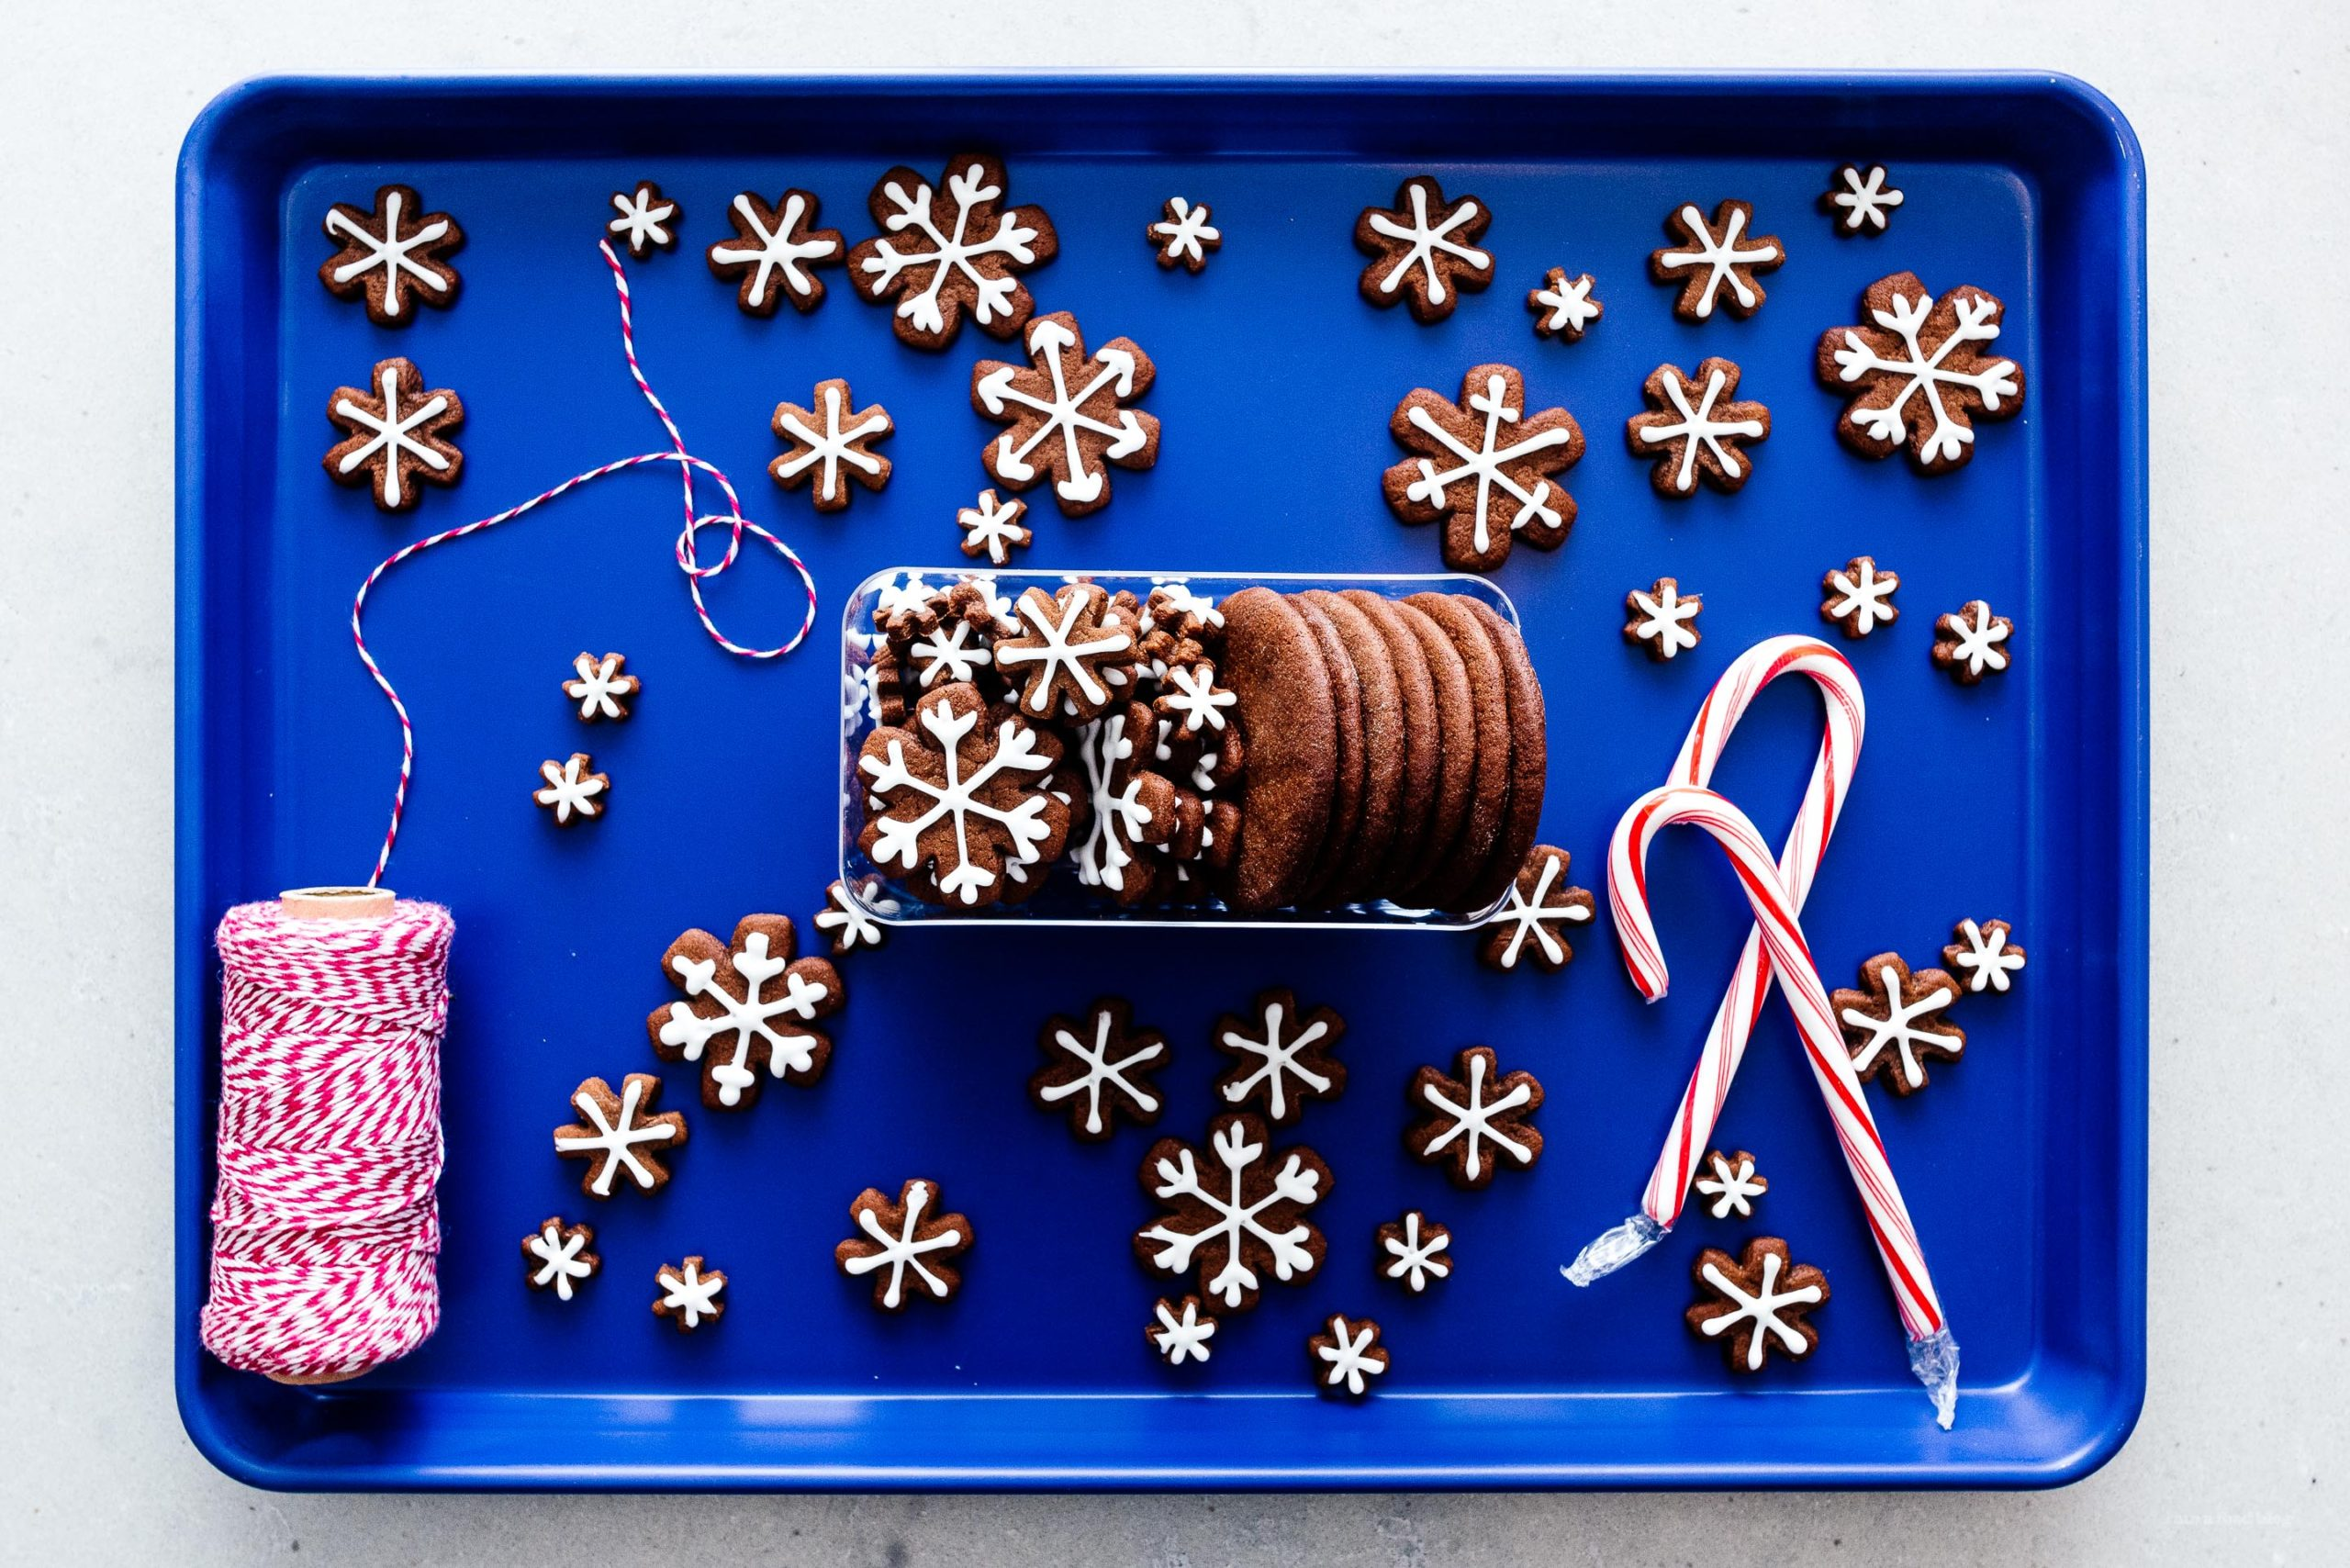 simple cut out gingerbread cookies #gingerbread #baking #cookies #recipe